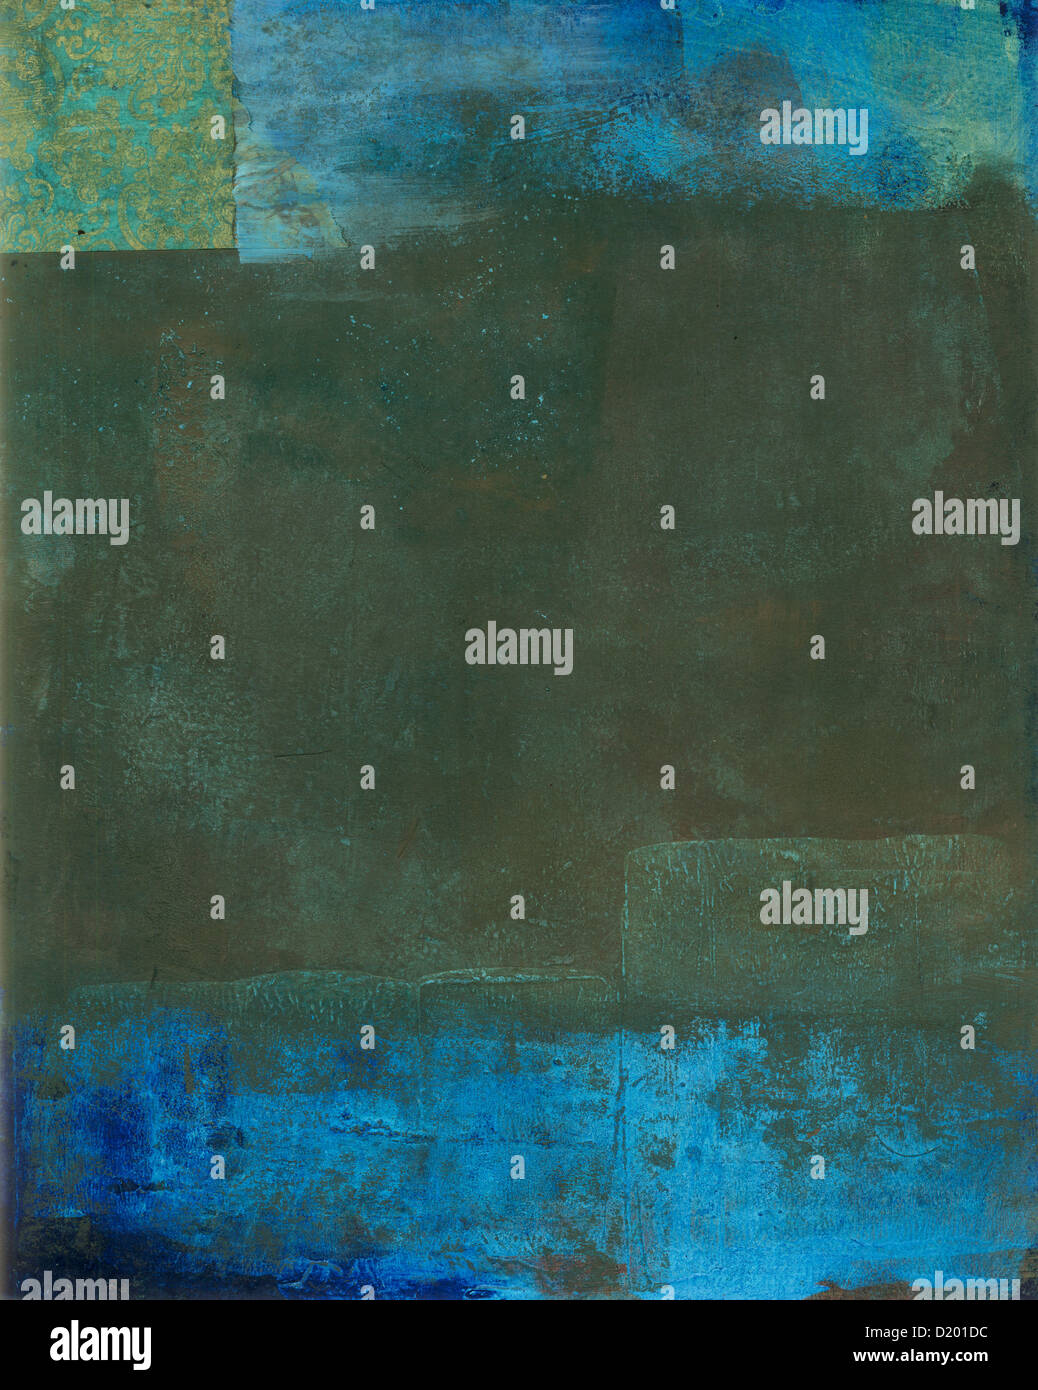 Pintura abstracta textural con tonos azules y verdes. Imagen De Stock